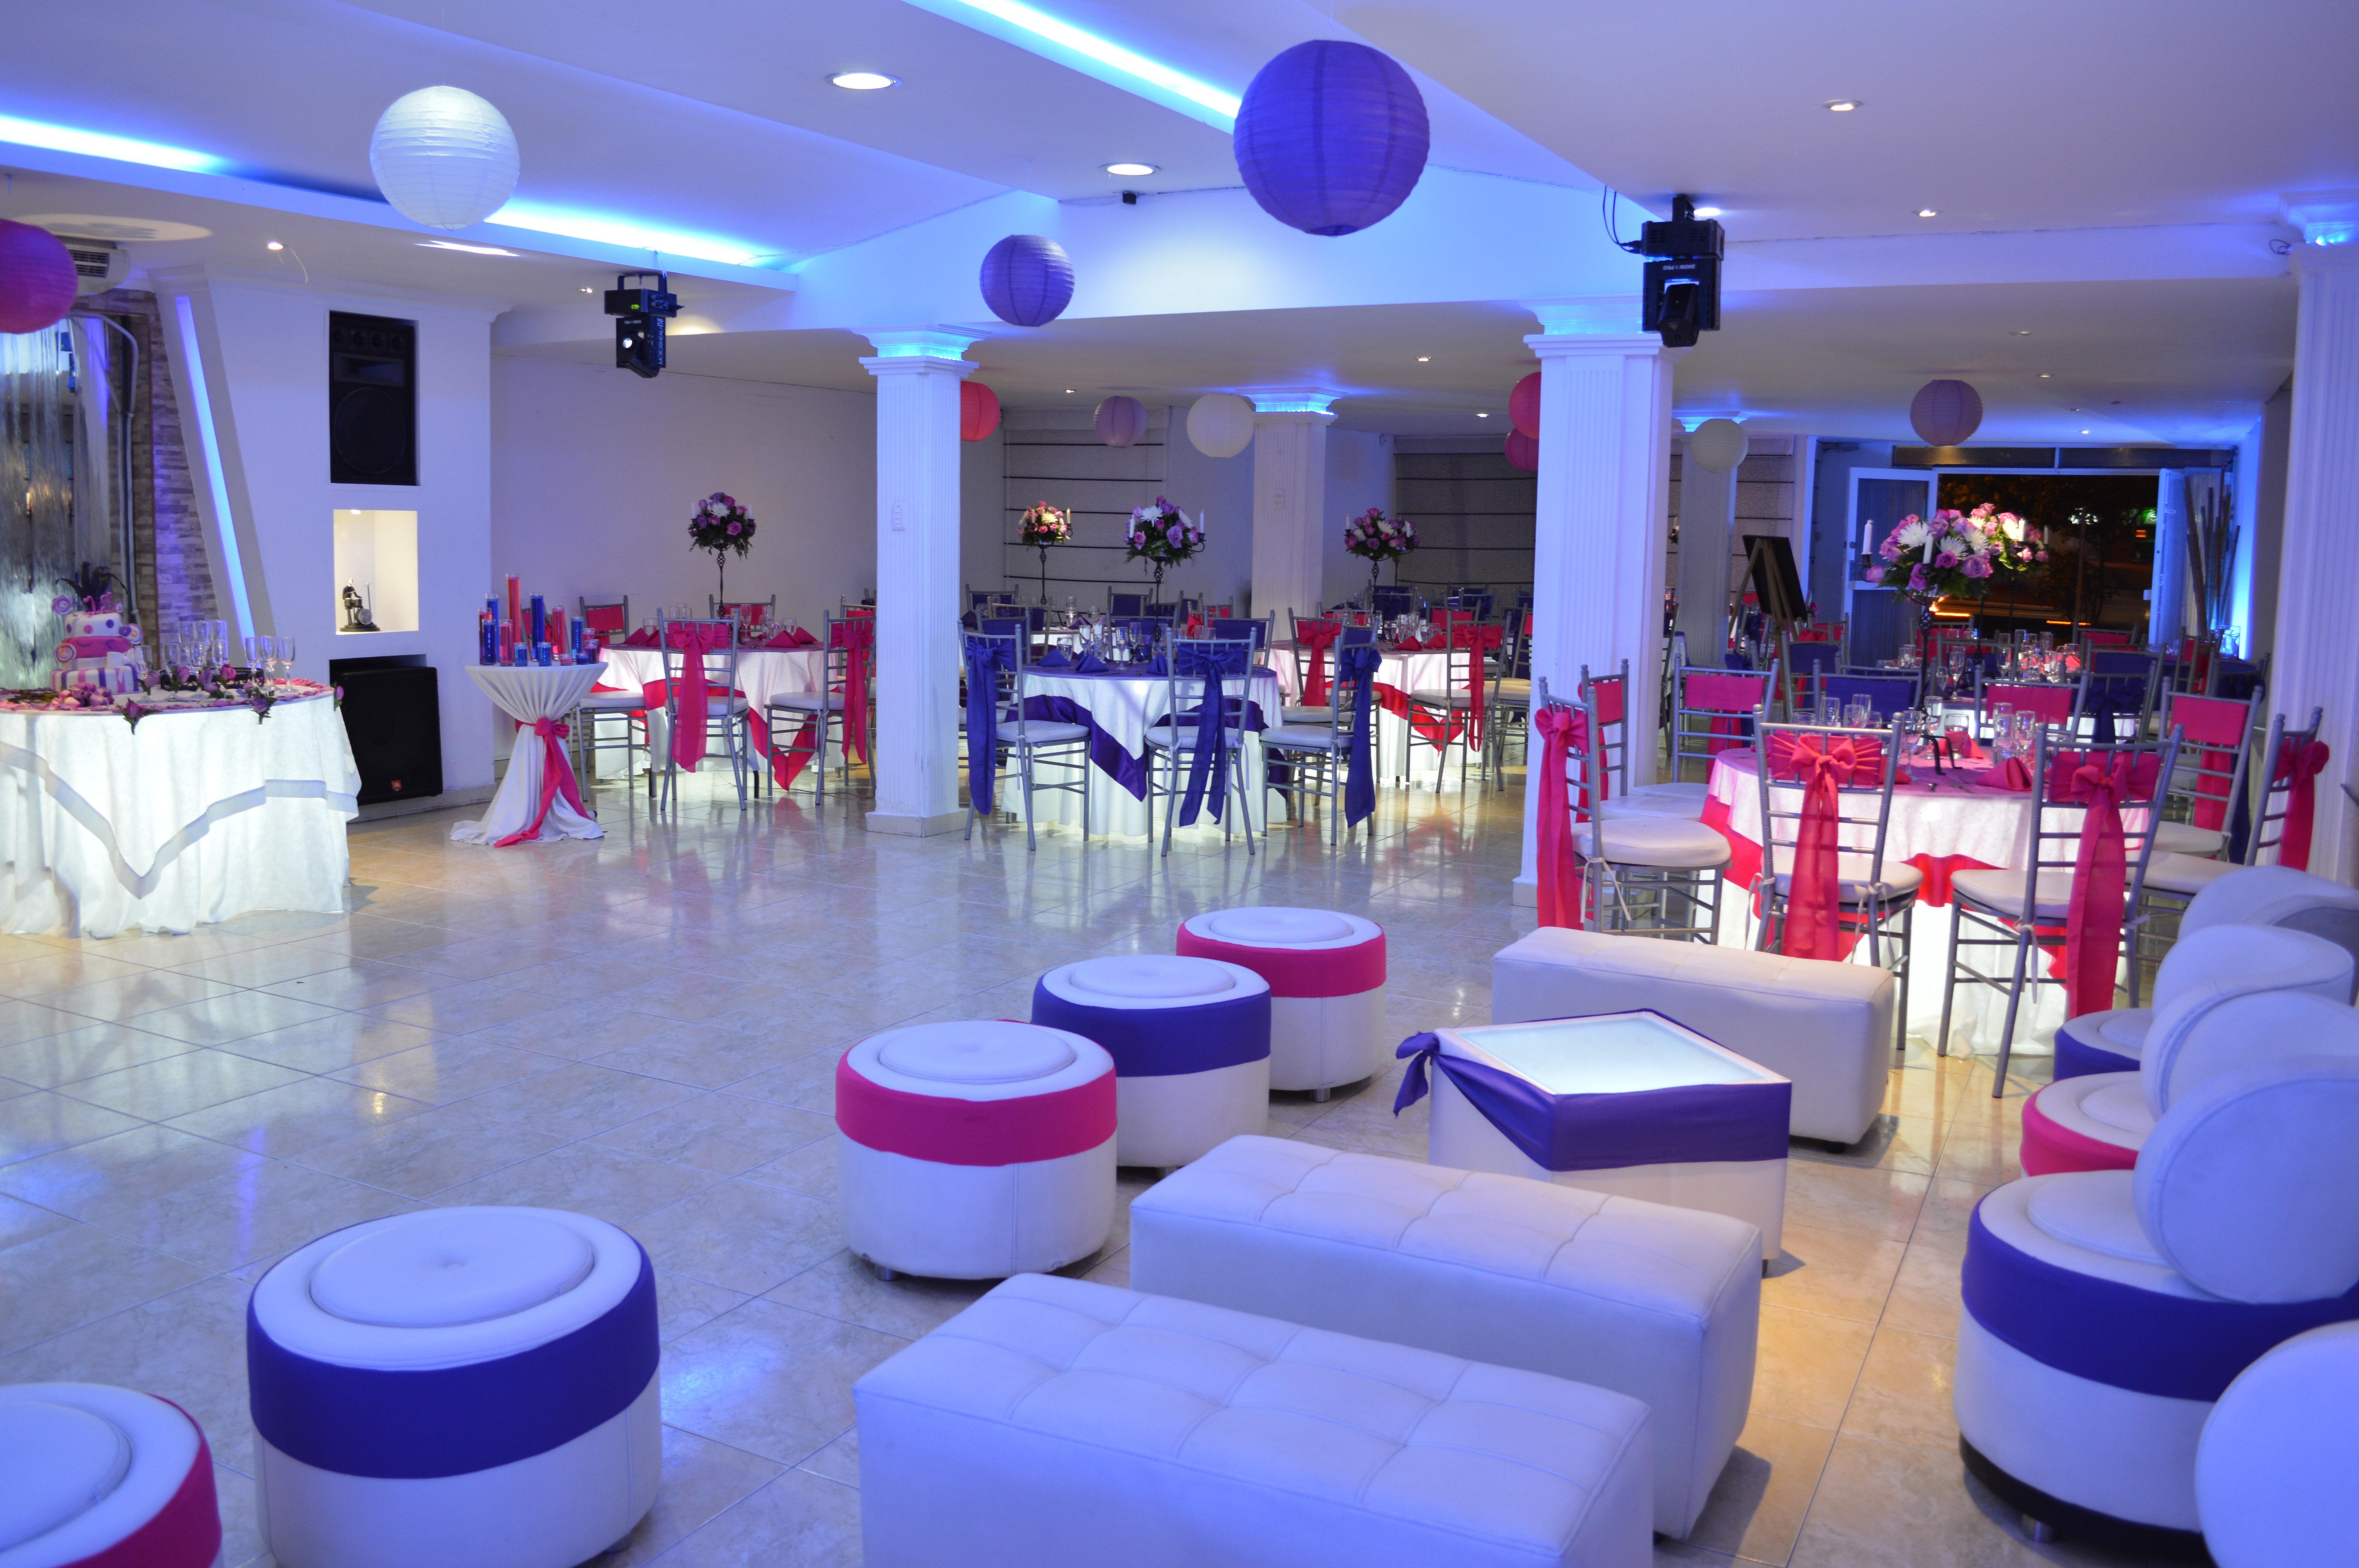 Salon de eventos bodas campestres salon de recepciones for Actividades de salon